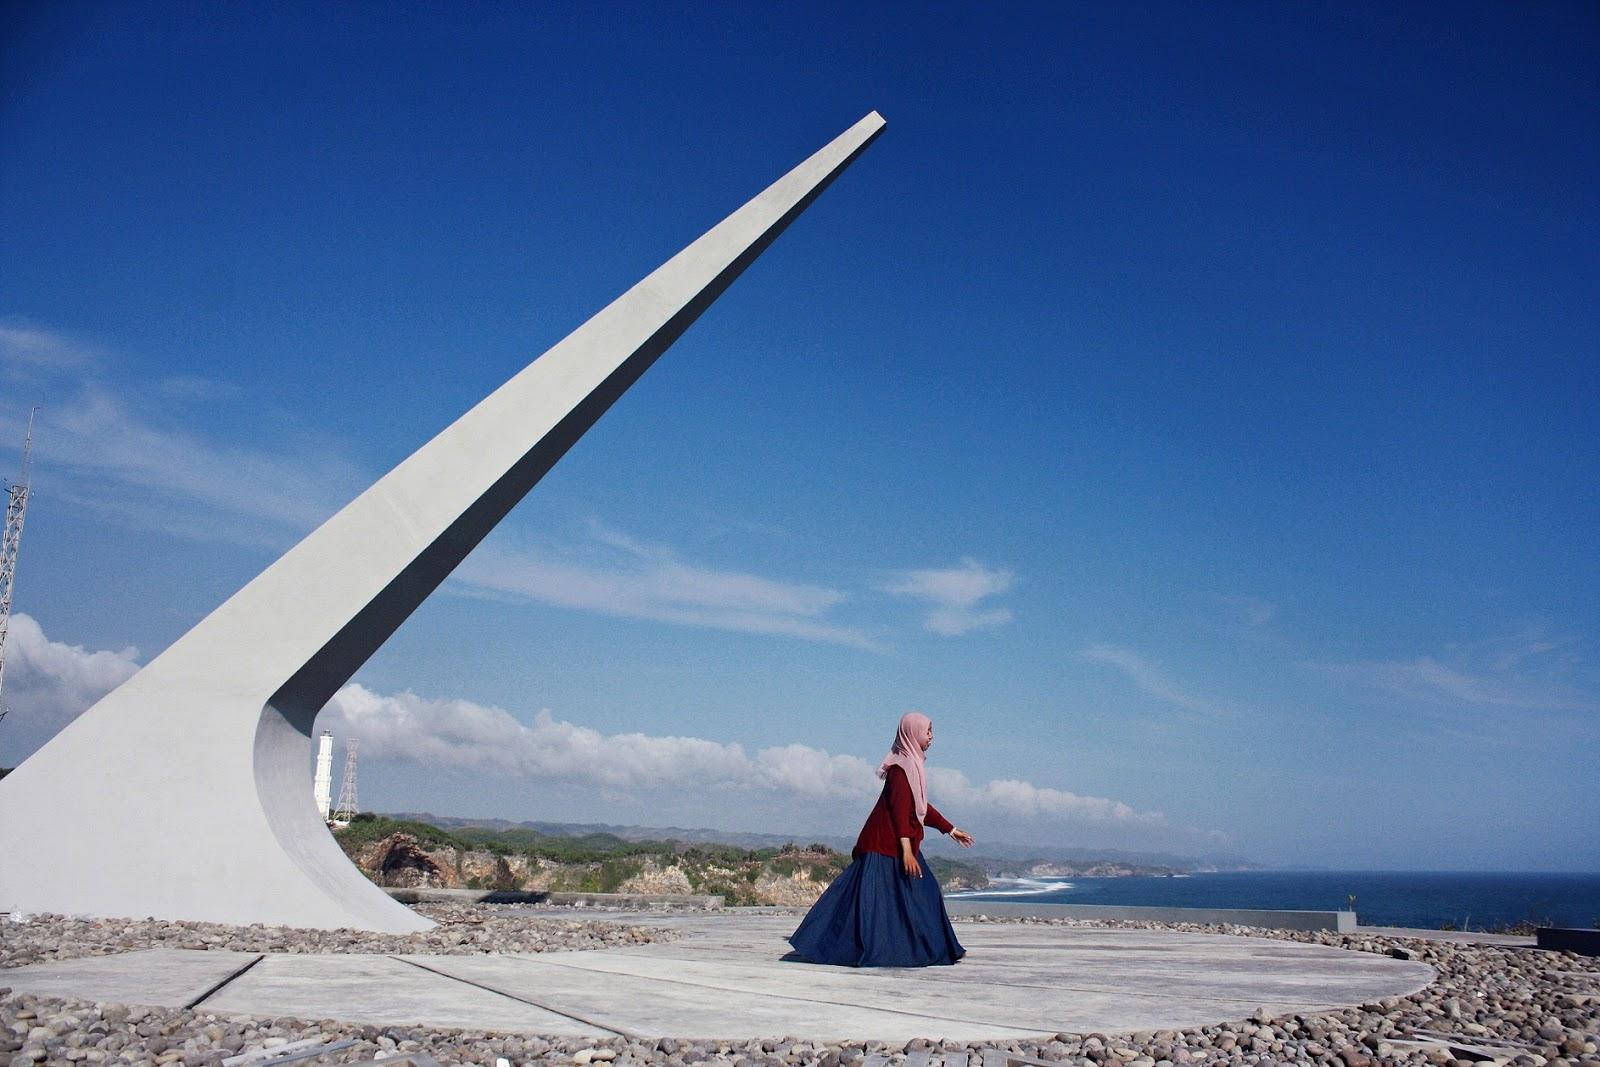 Dwi Susanti Langit Biru Baron Technopark Begitulah Langitnya Sungguh Cerah